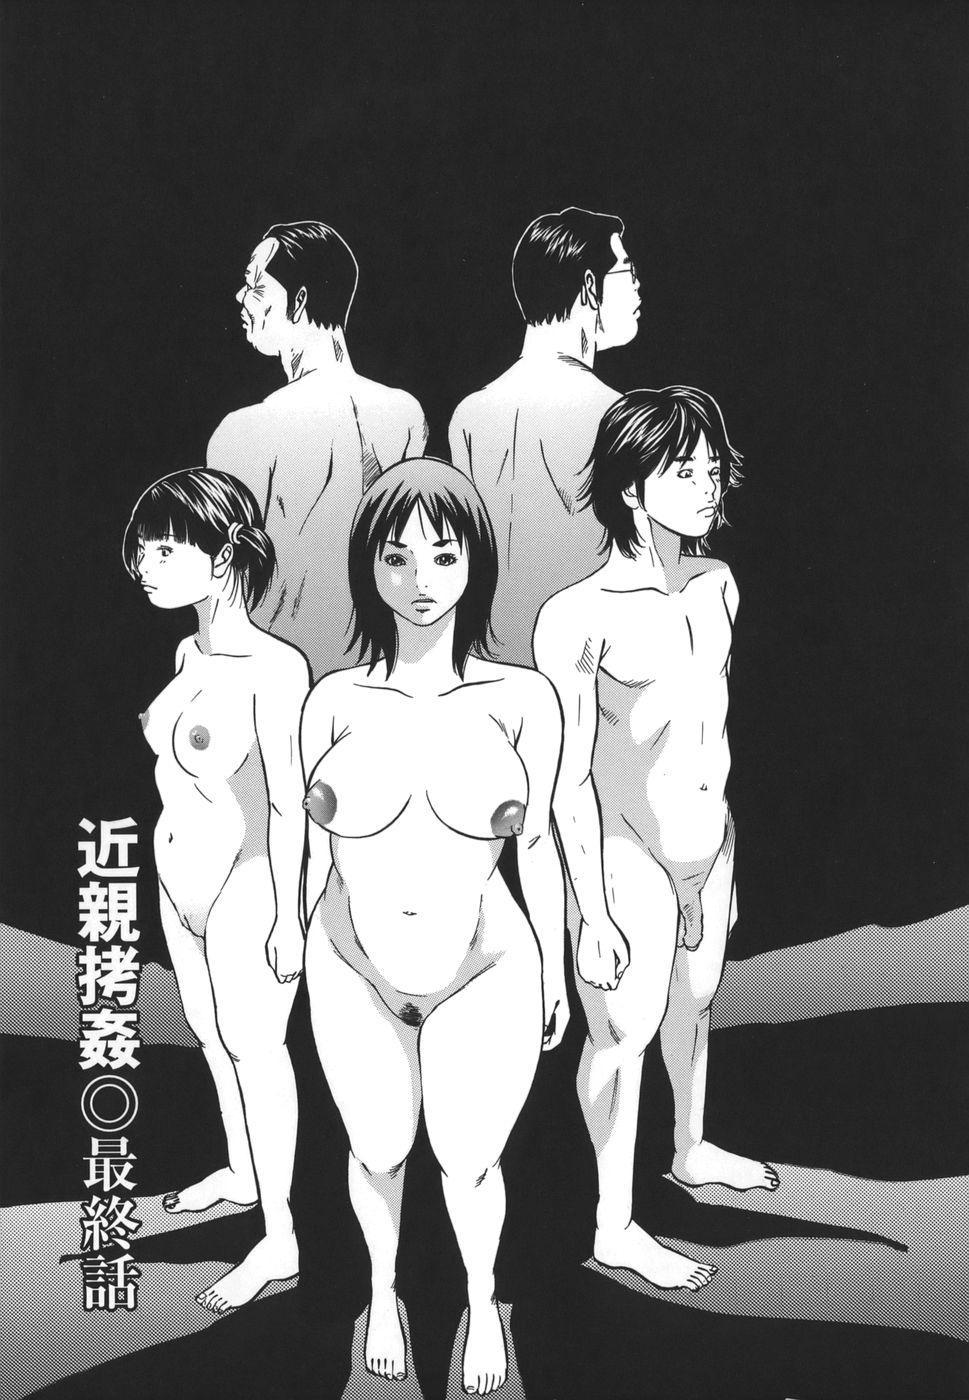 Kinshin Goukan - Near Relation Rapes 186